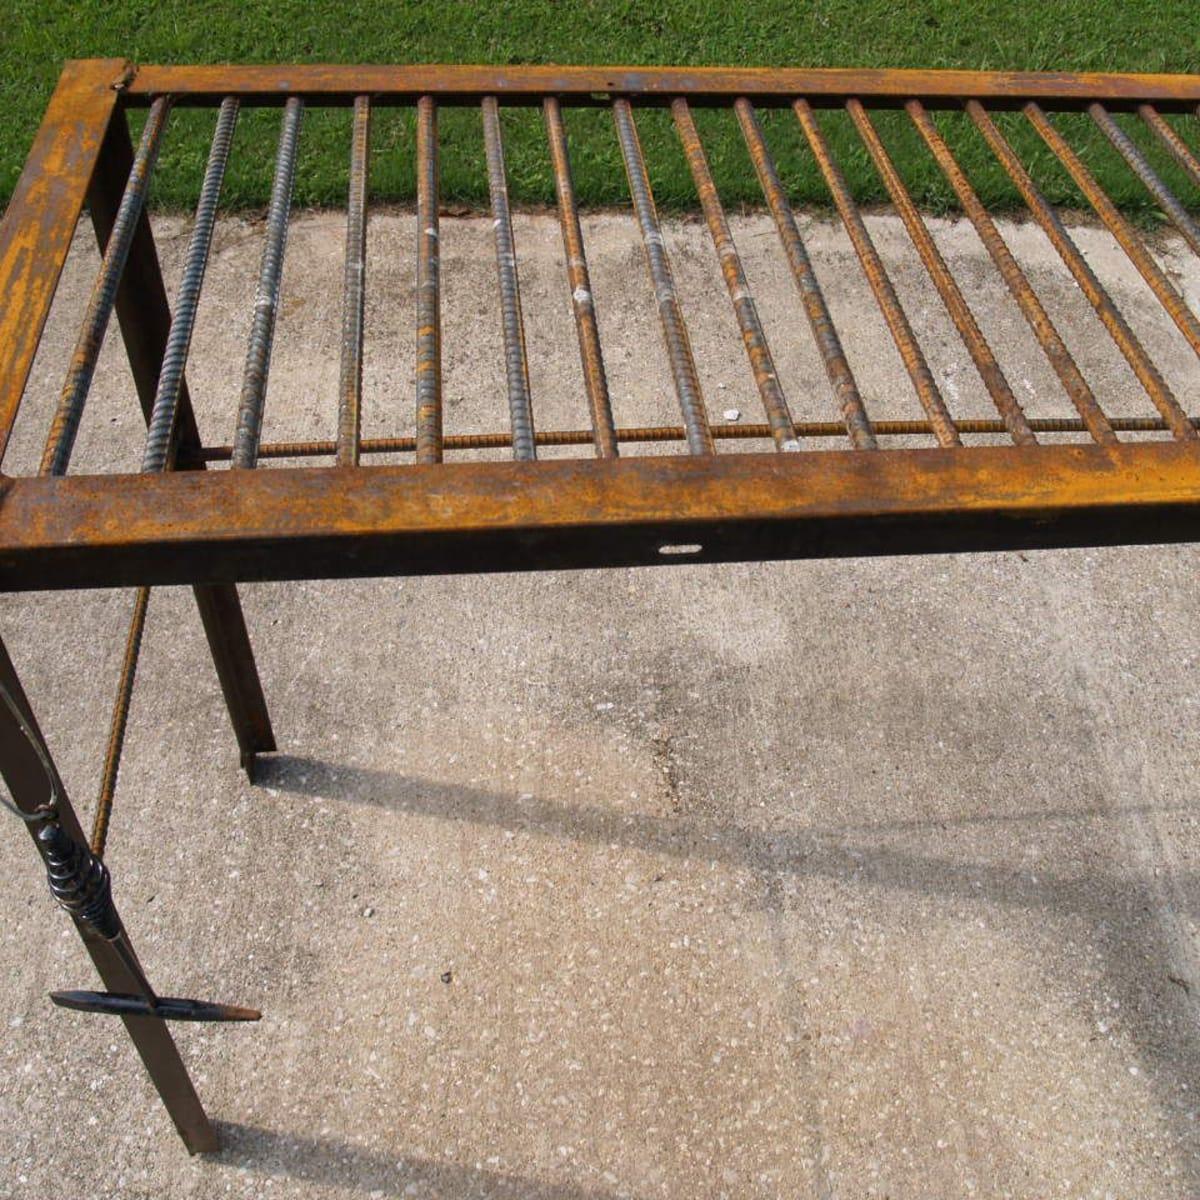 rebar and used bed frame metal